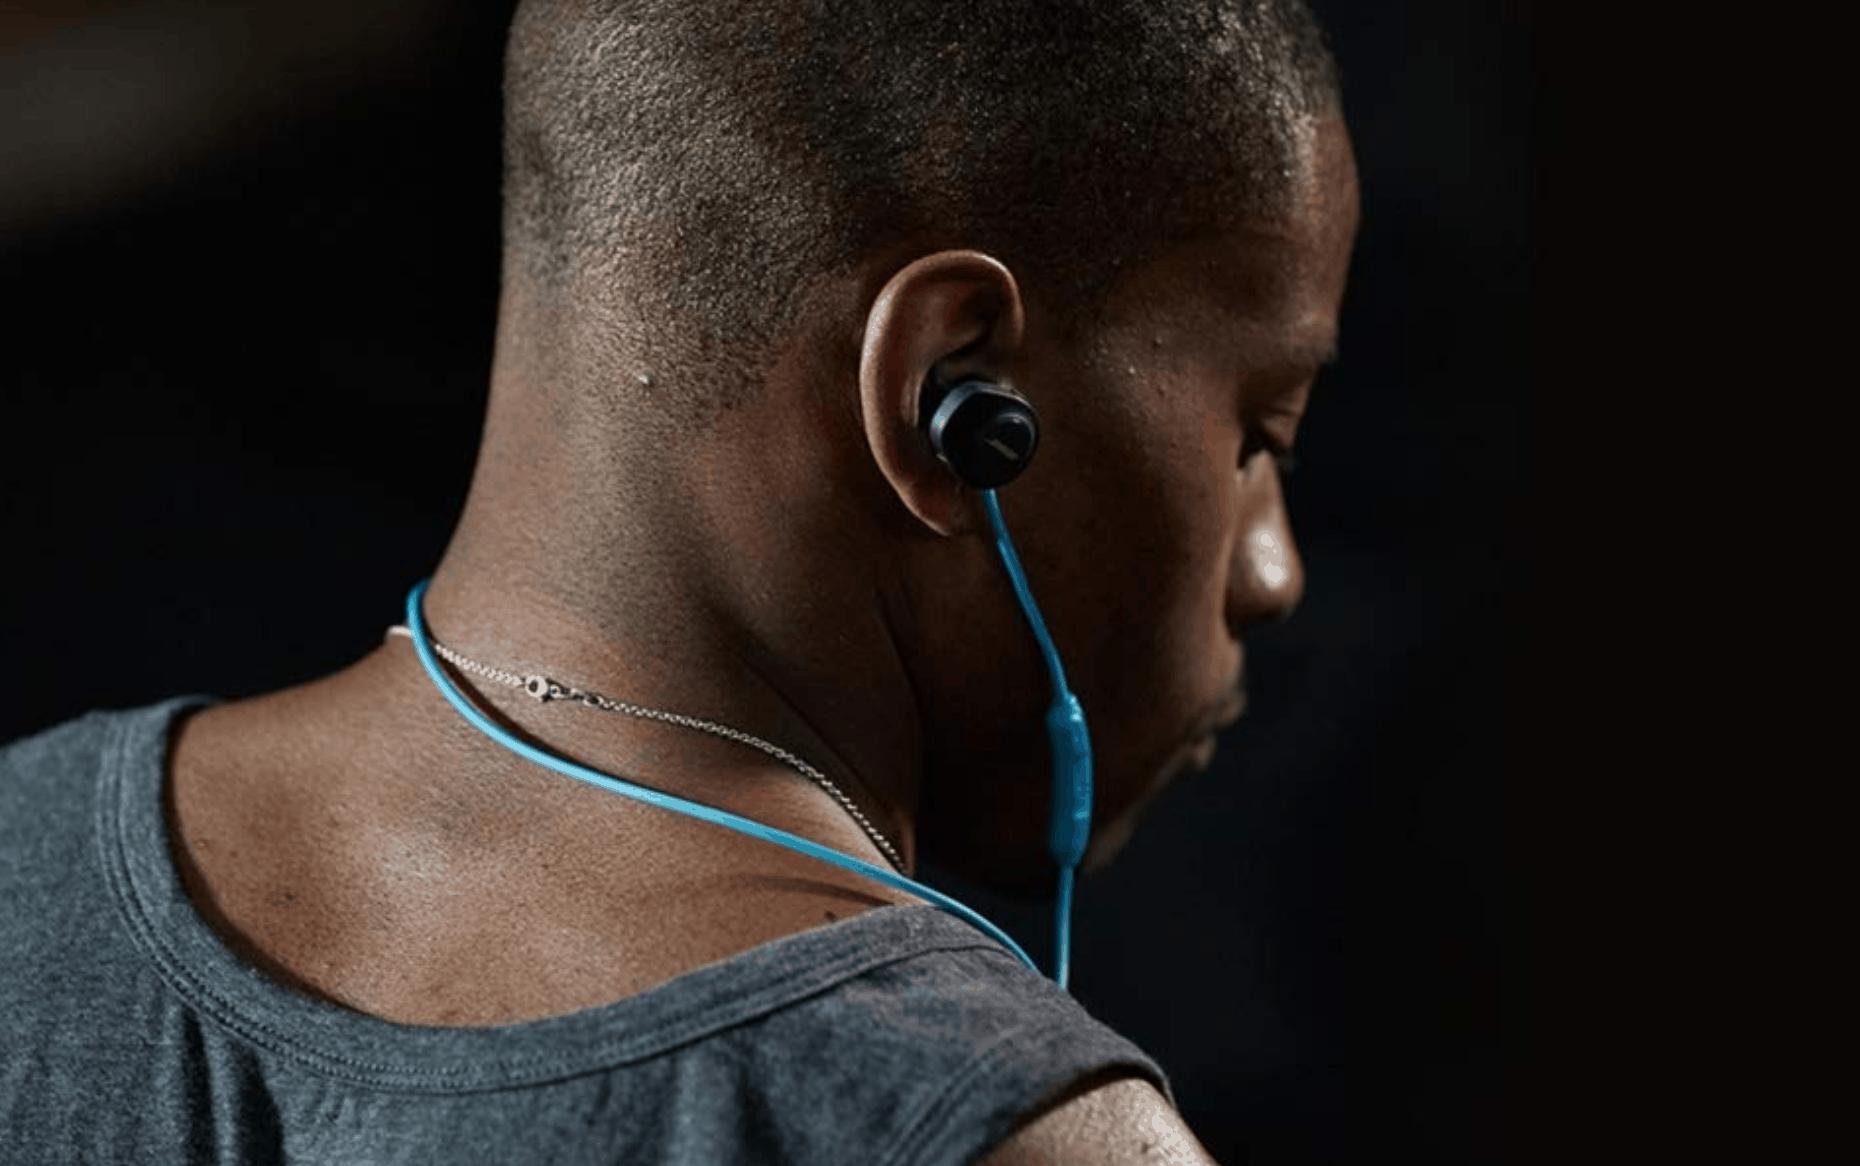 Bose SoundSport - Most Affordable Bose Headphones